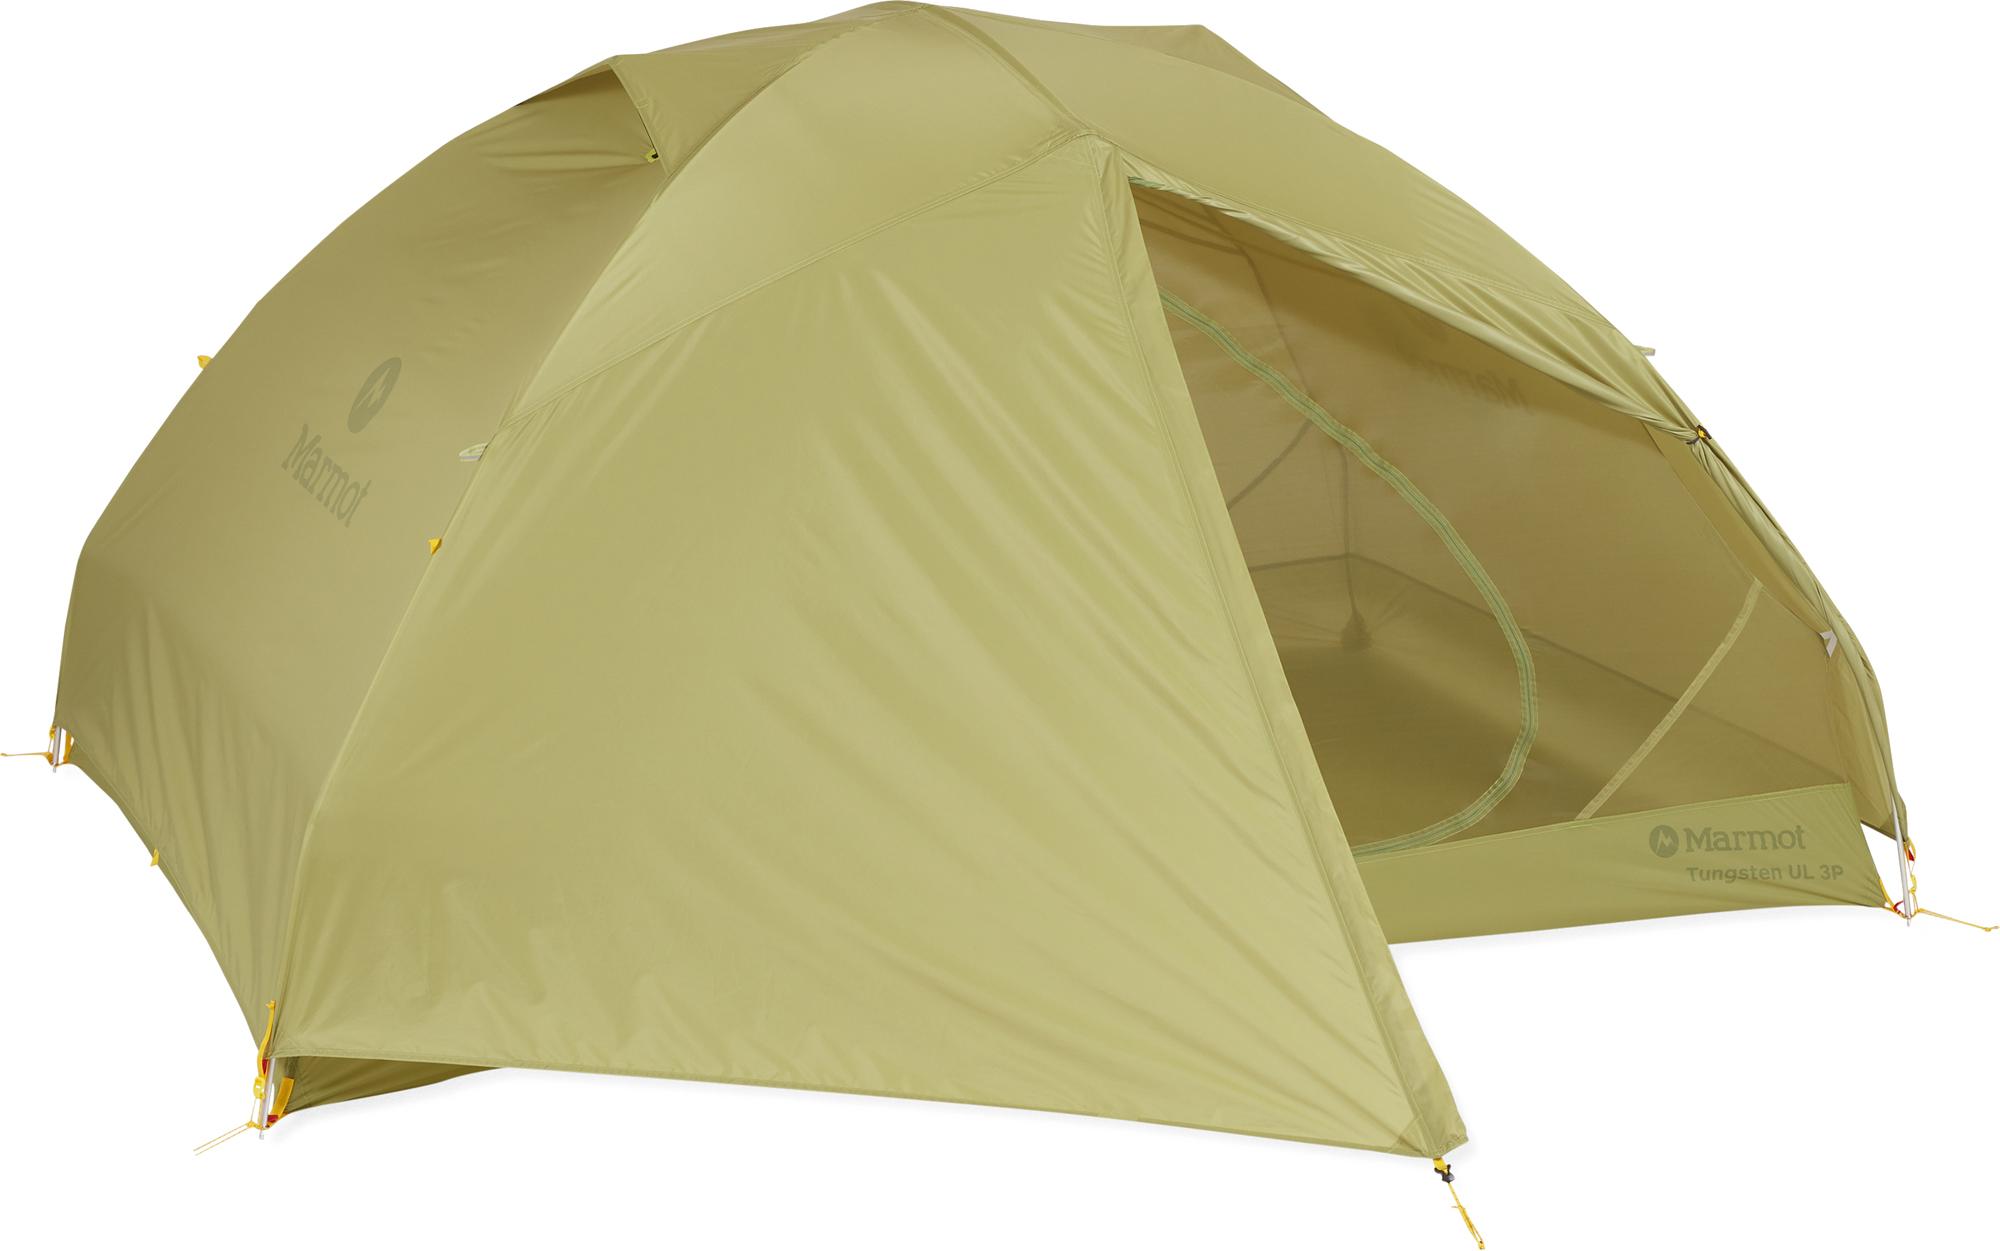 Фото - Marmot Палатка 3-местная Marmot Tungsten UL 3P палатка greenhouse fct 32 трехместная